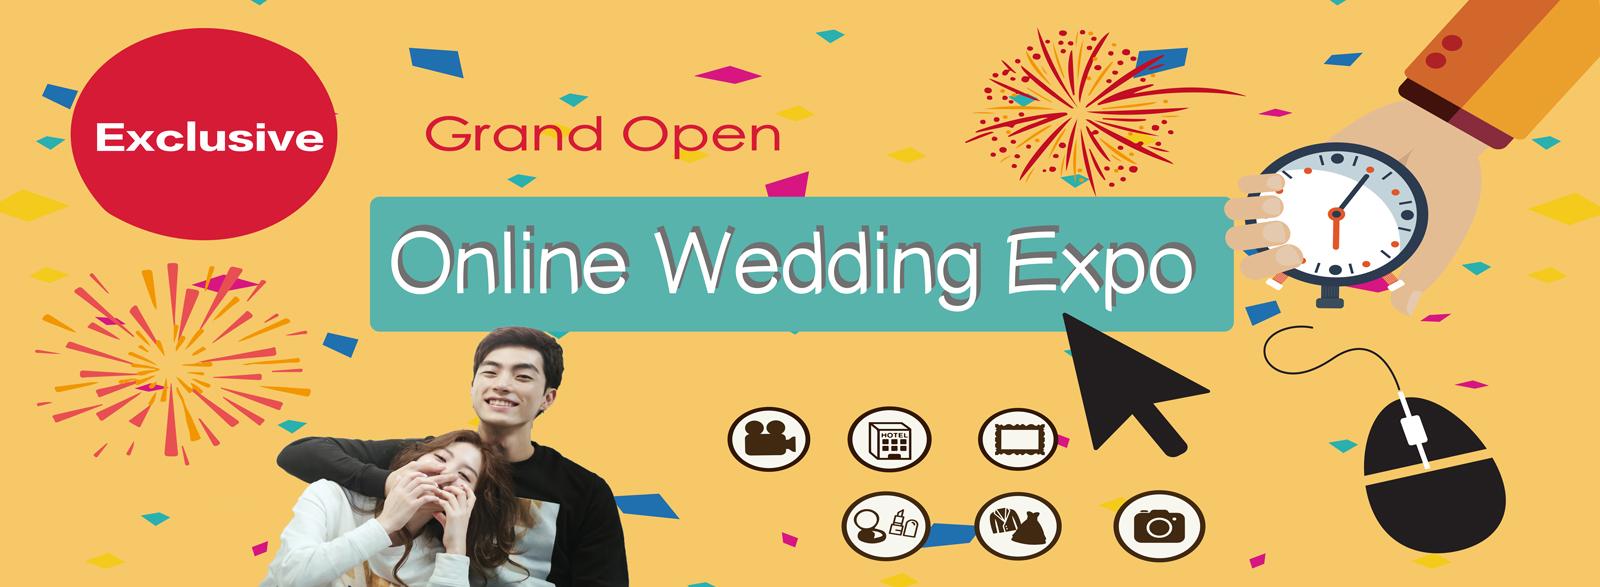 TAEHEE WEDDING Onling Wedding Expo - English